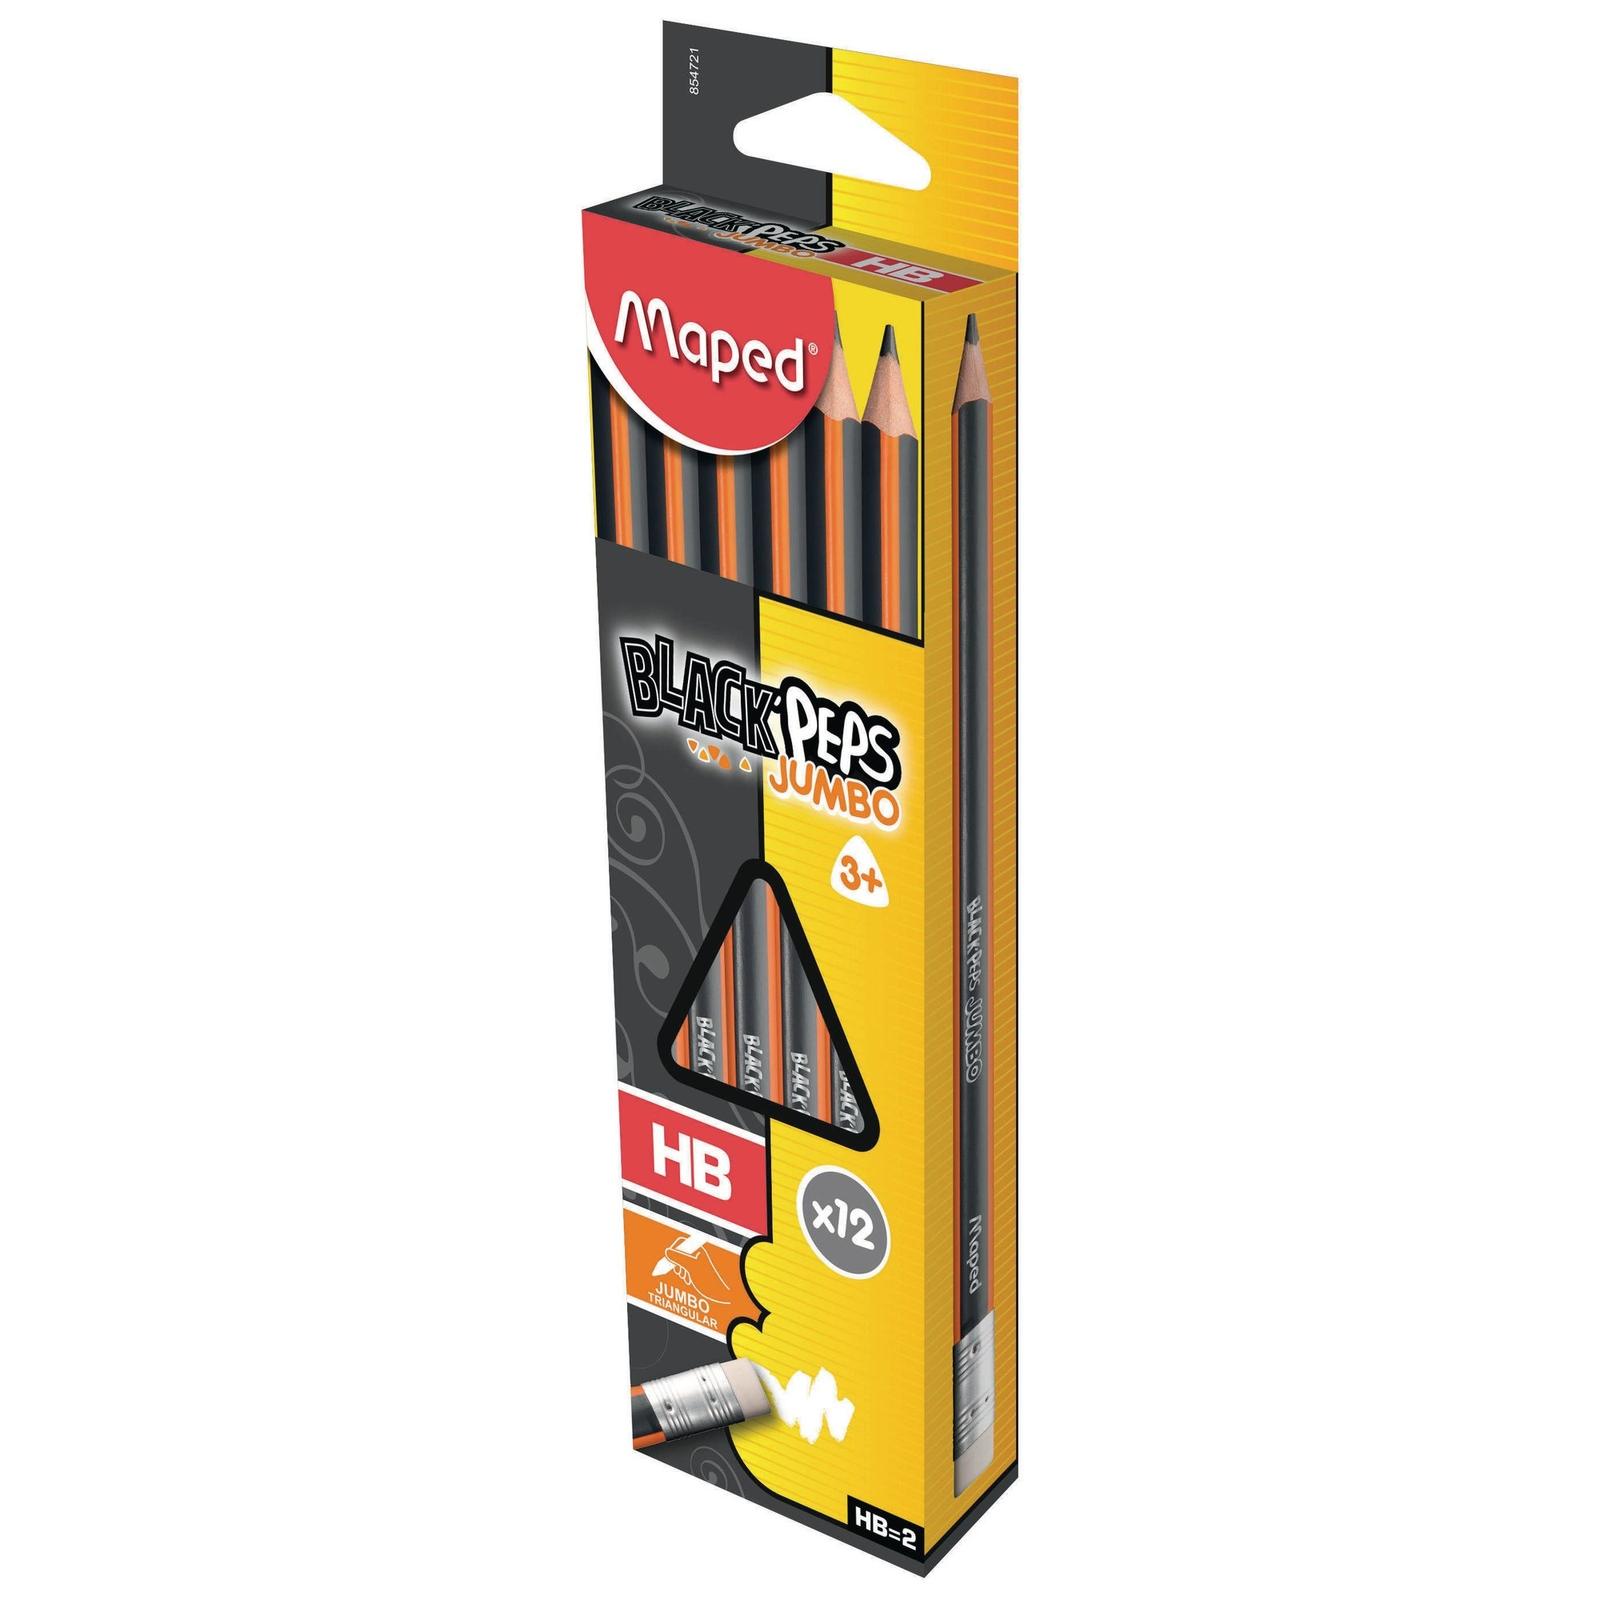 HB Graphite Eraser Tipped Learner Pencils - Pack of 12